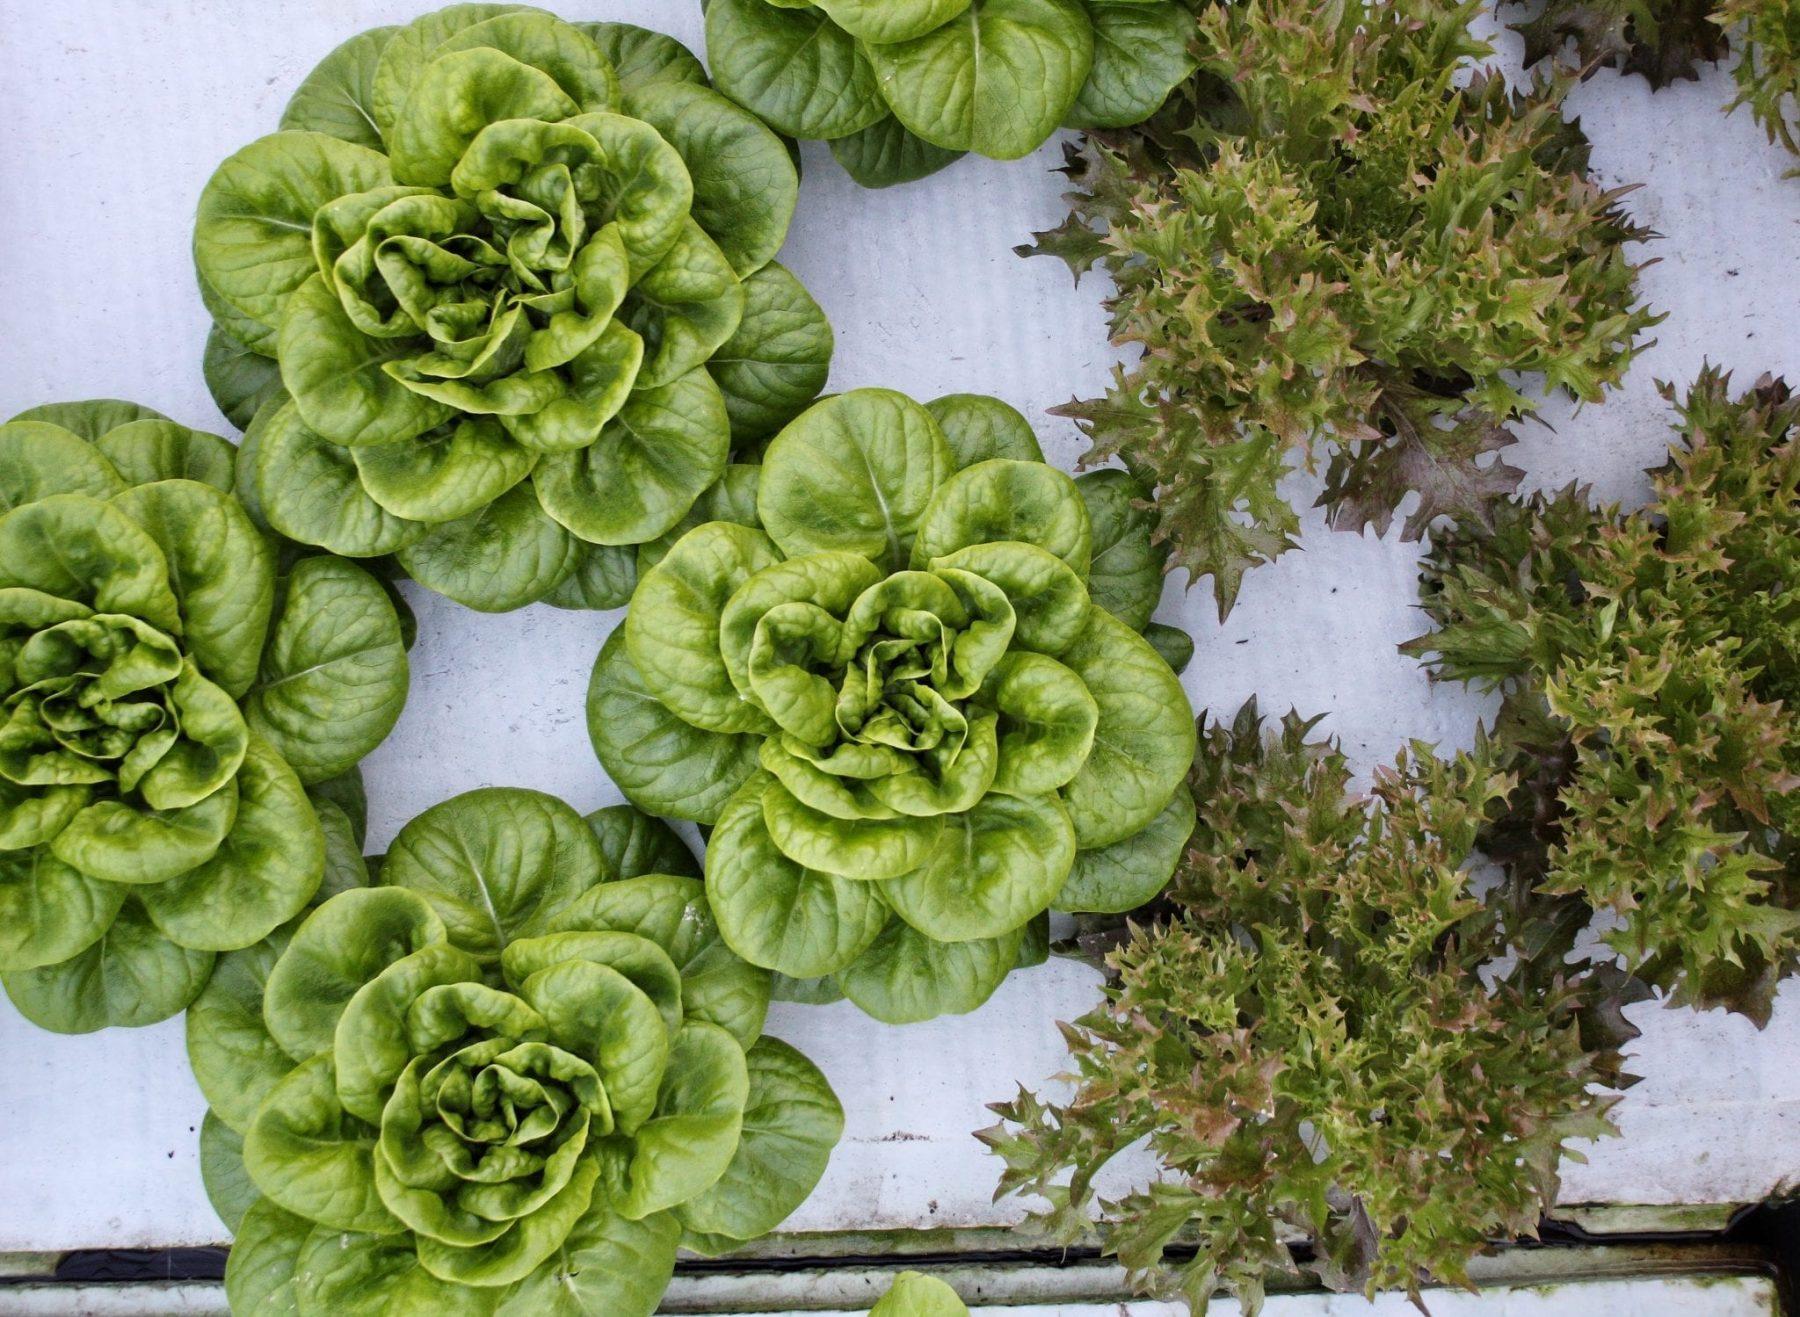 Giving Season: 3 Ways Mill Creek Urban Farm Is Doing Just That